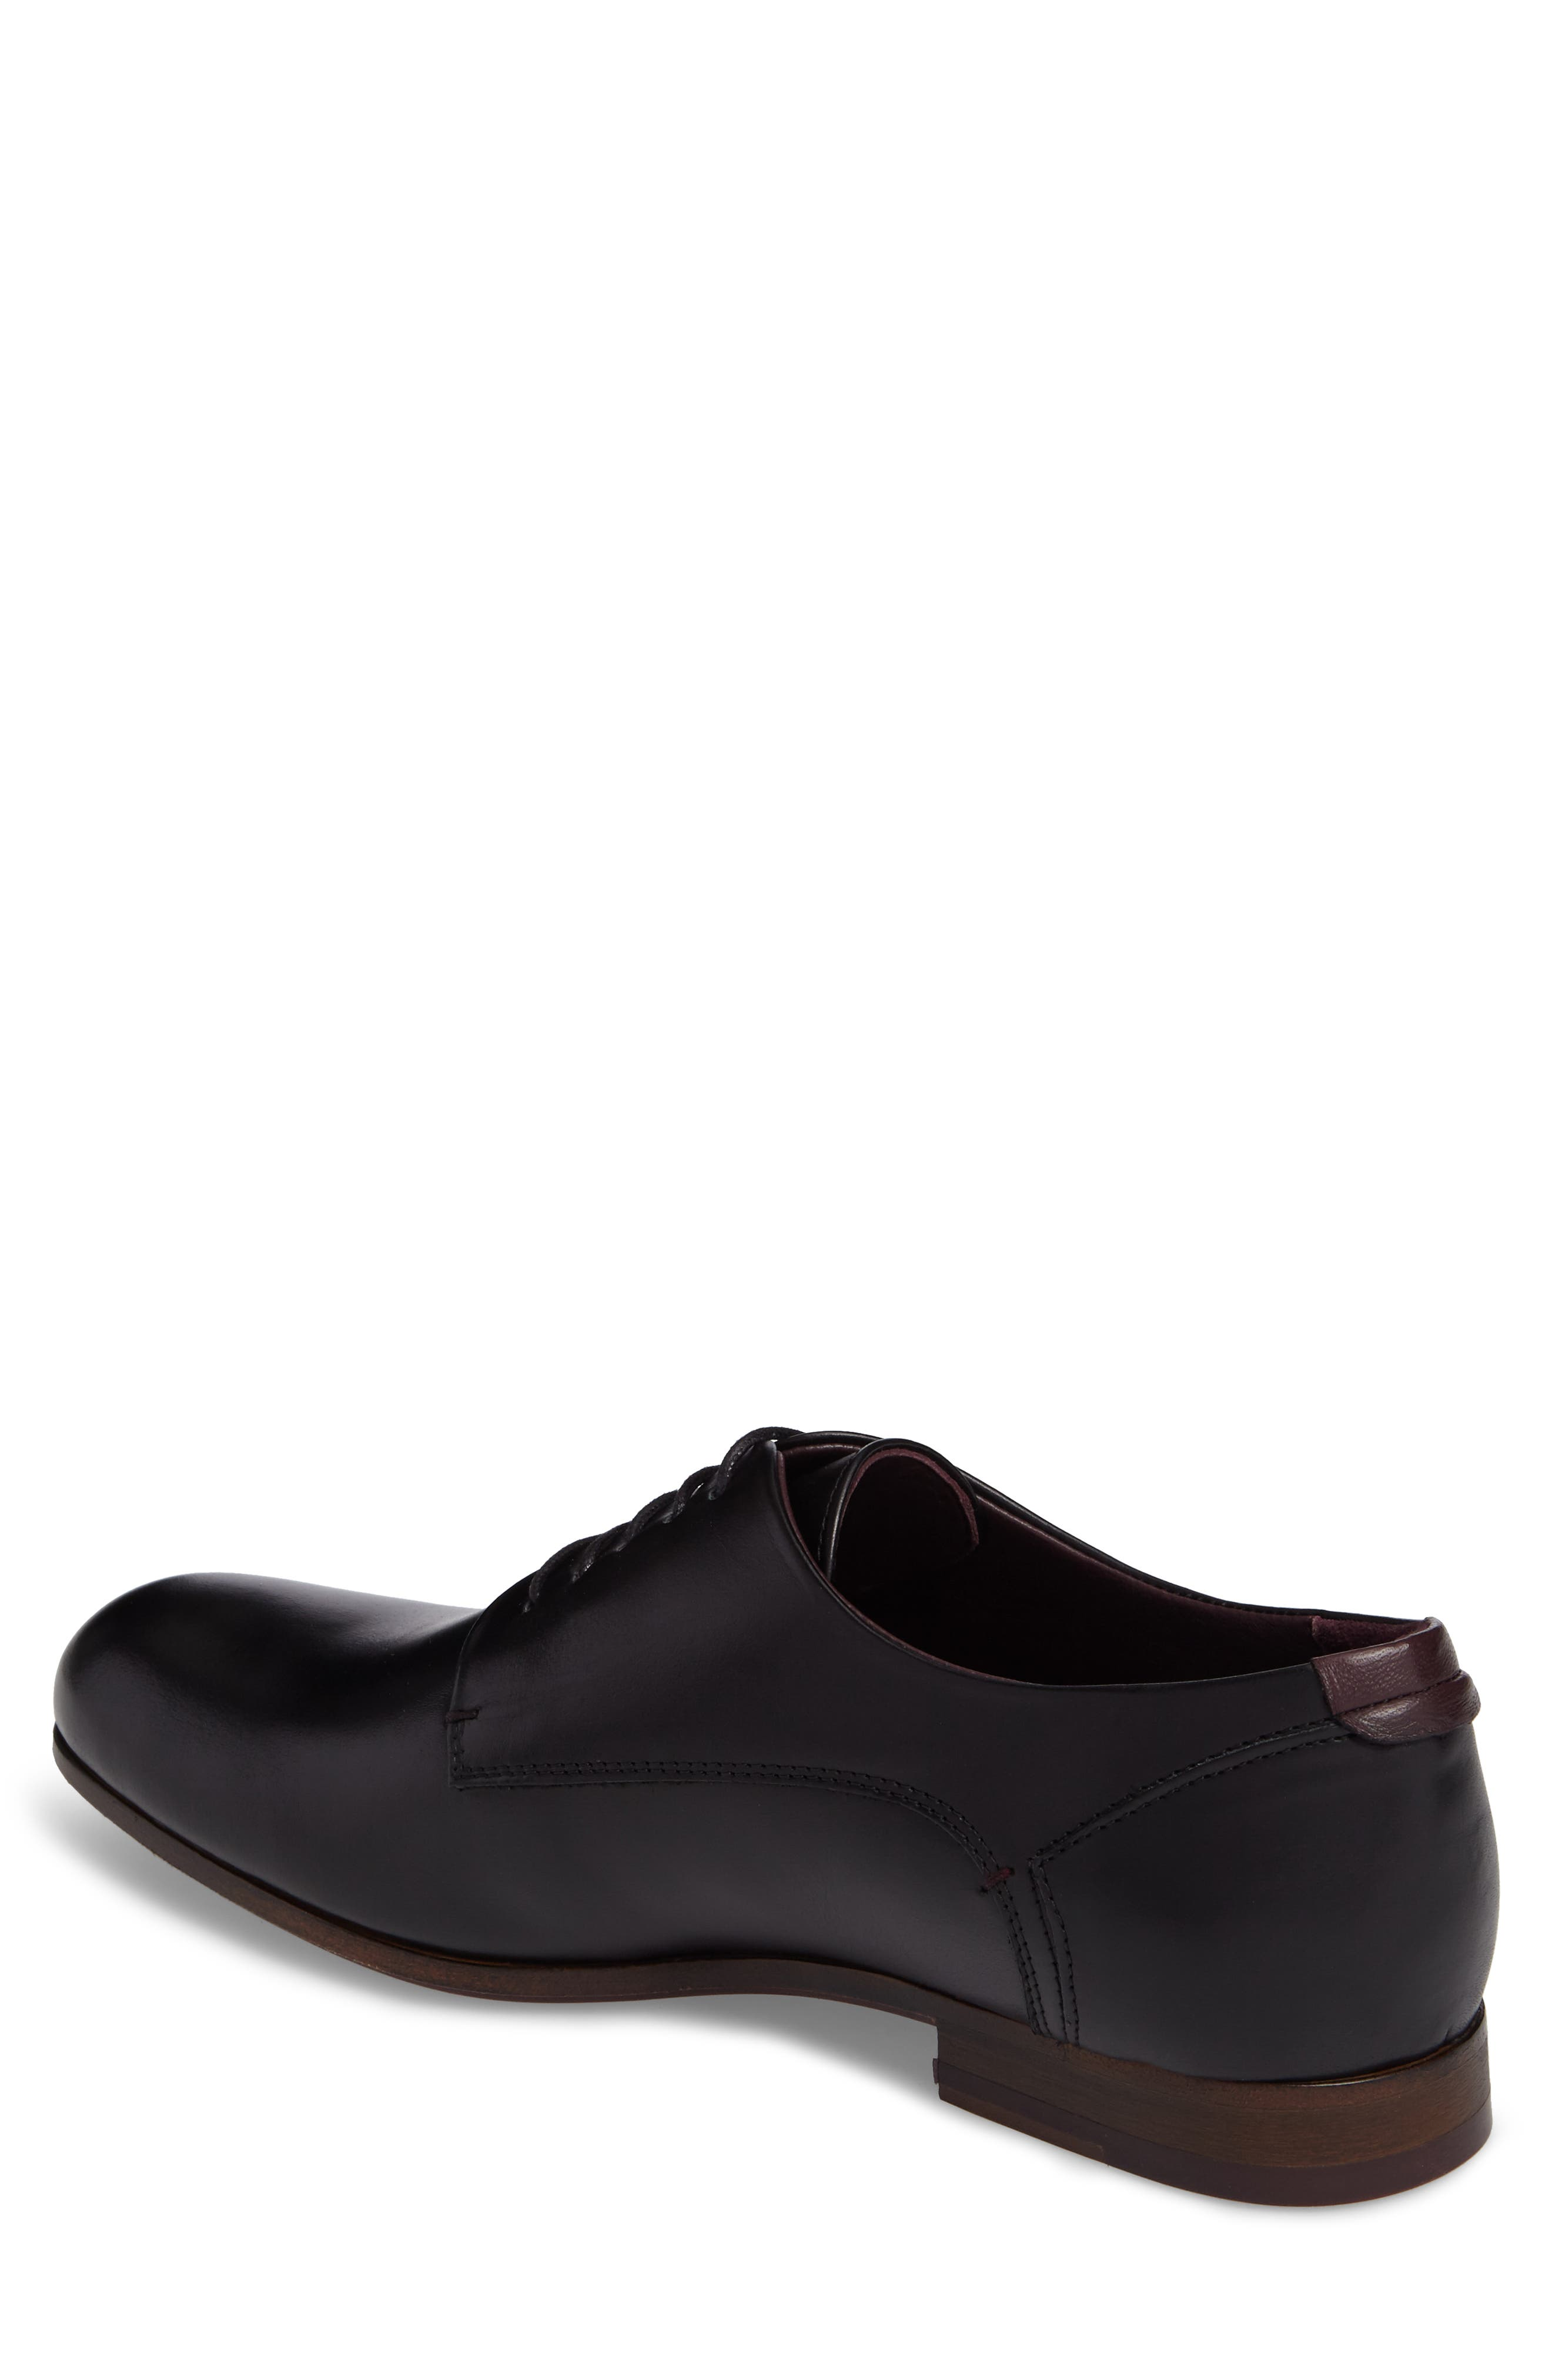 Avionn Plain Toe Derby,                             Alternate thumbnail 2, color,                             Black Leather